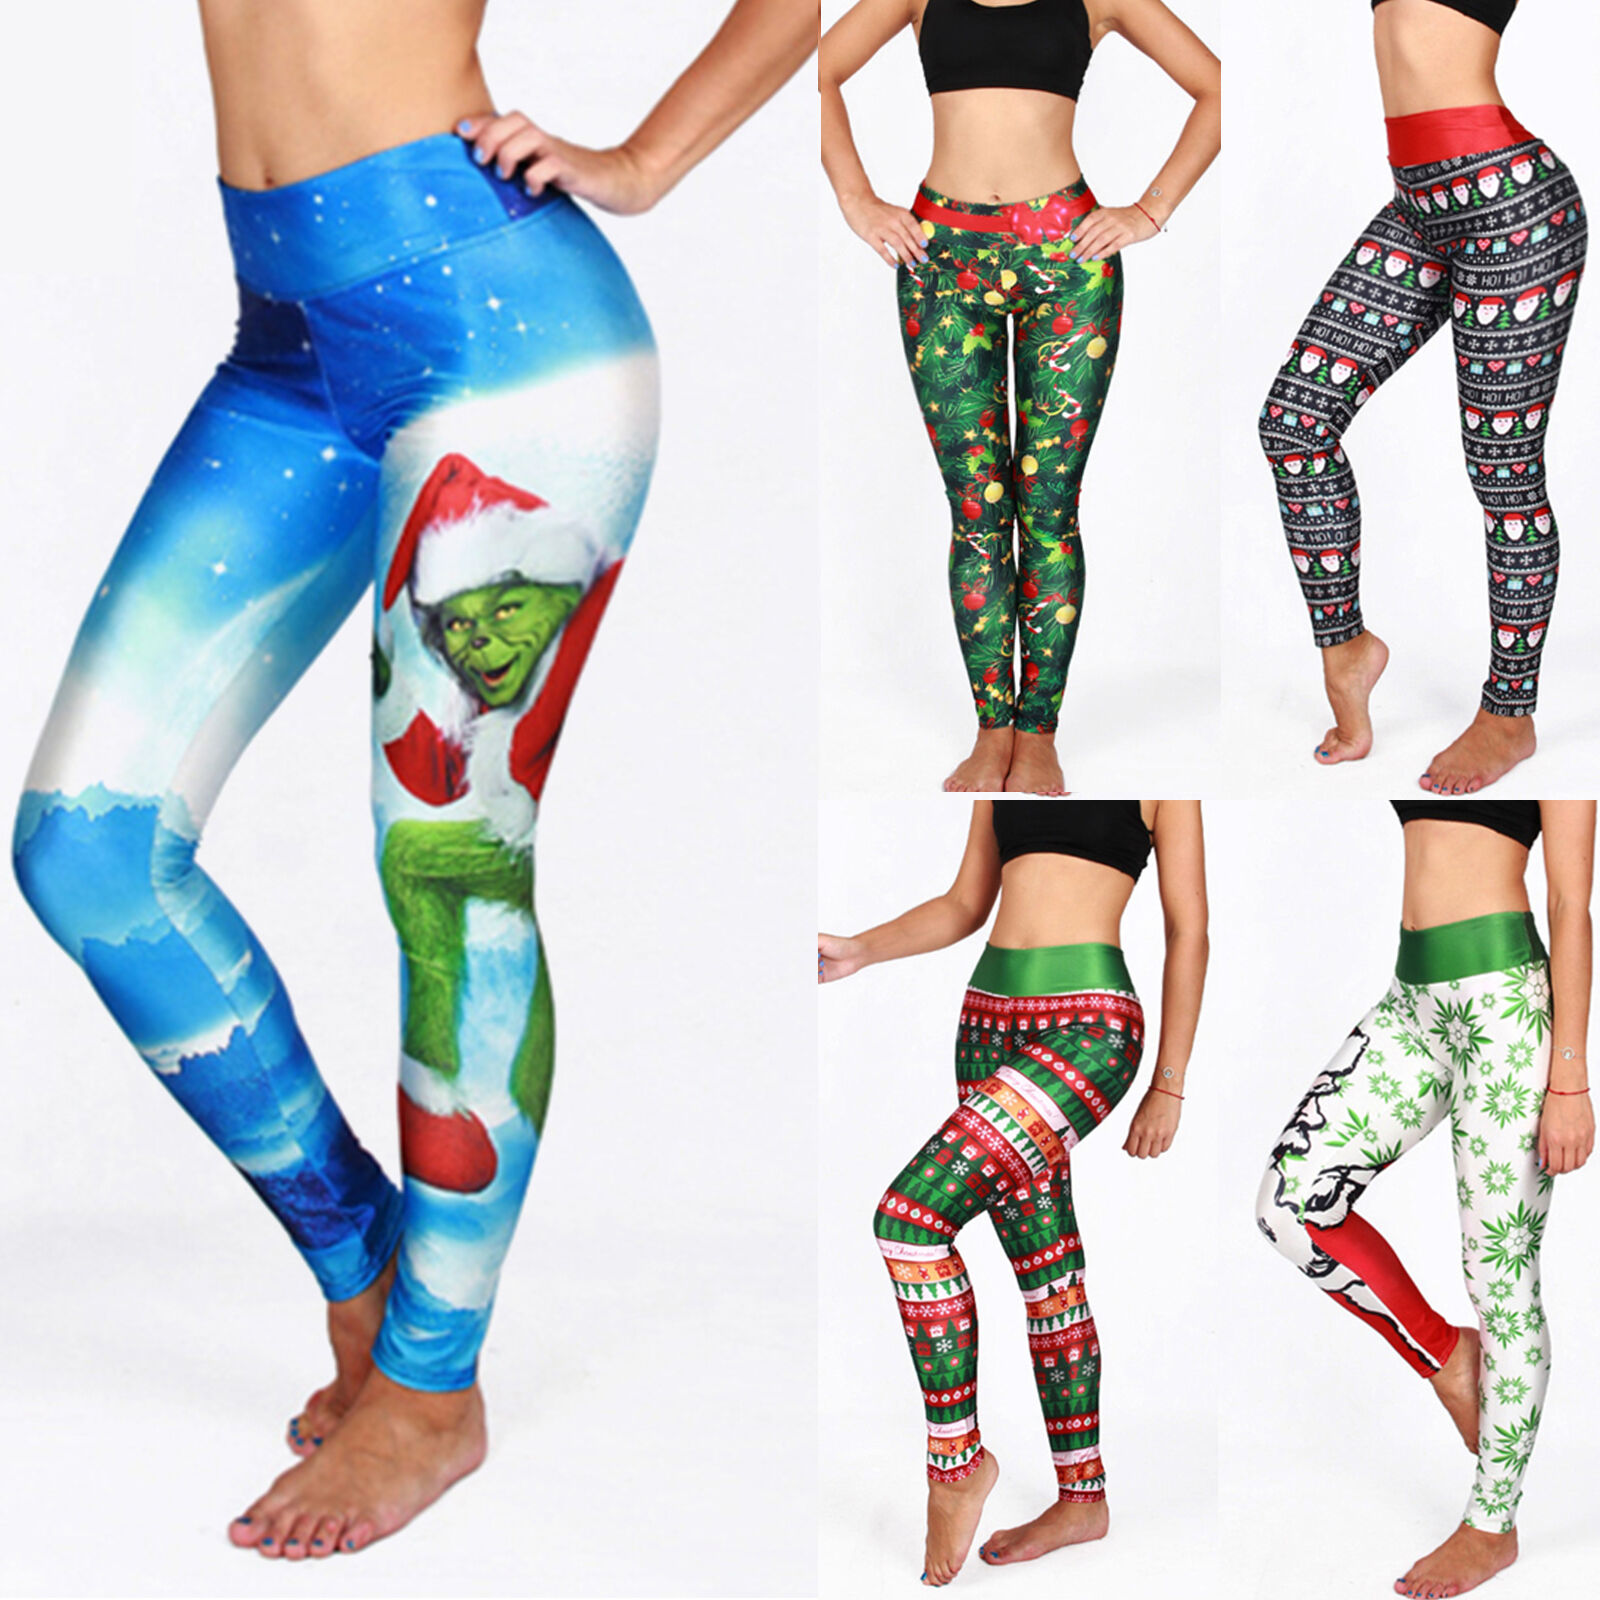 1972664ef4d851 Womens Christmas Snowflake Leggings Winter Xmas Slim Skinny Stretch Pencil  Pants 6 6 of 10 ...